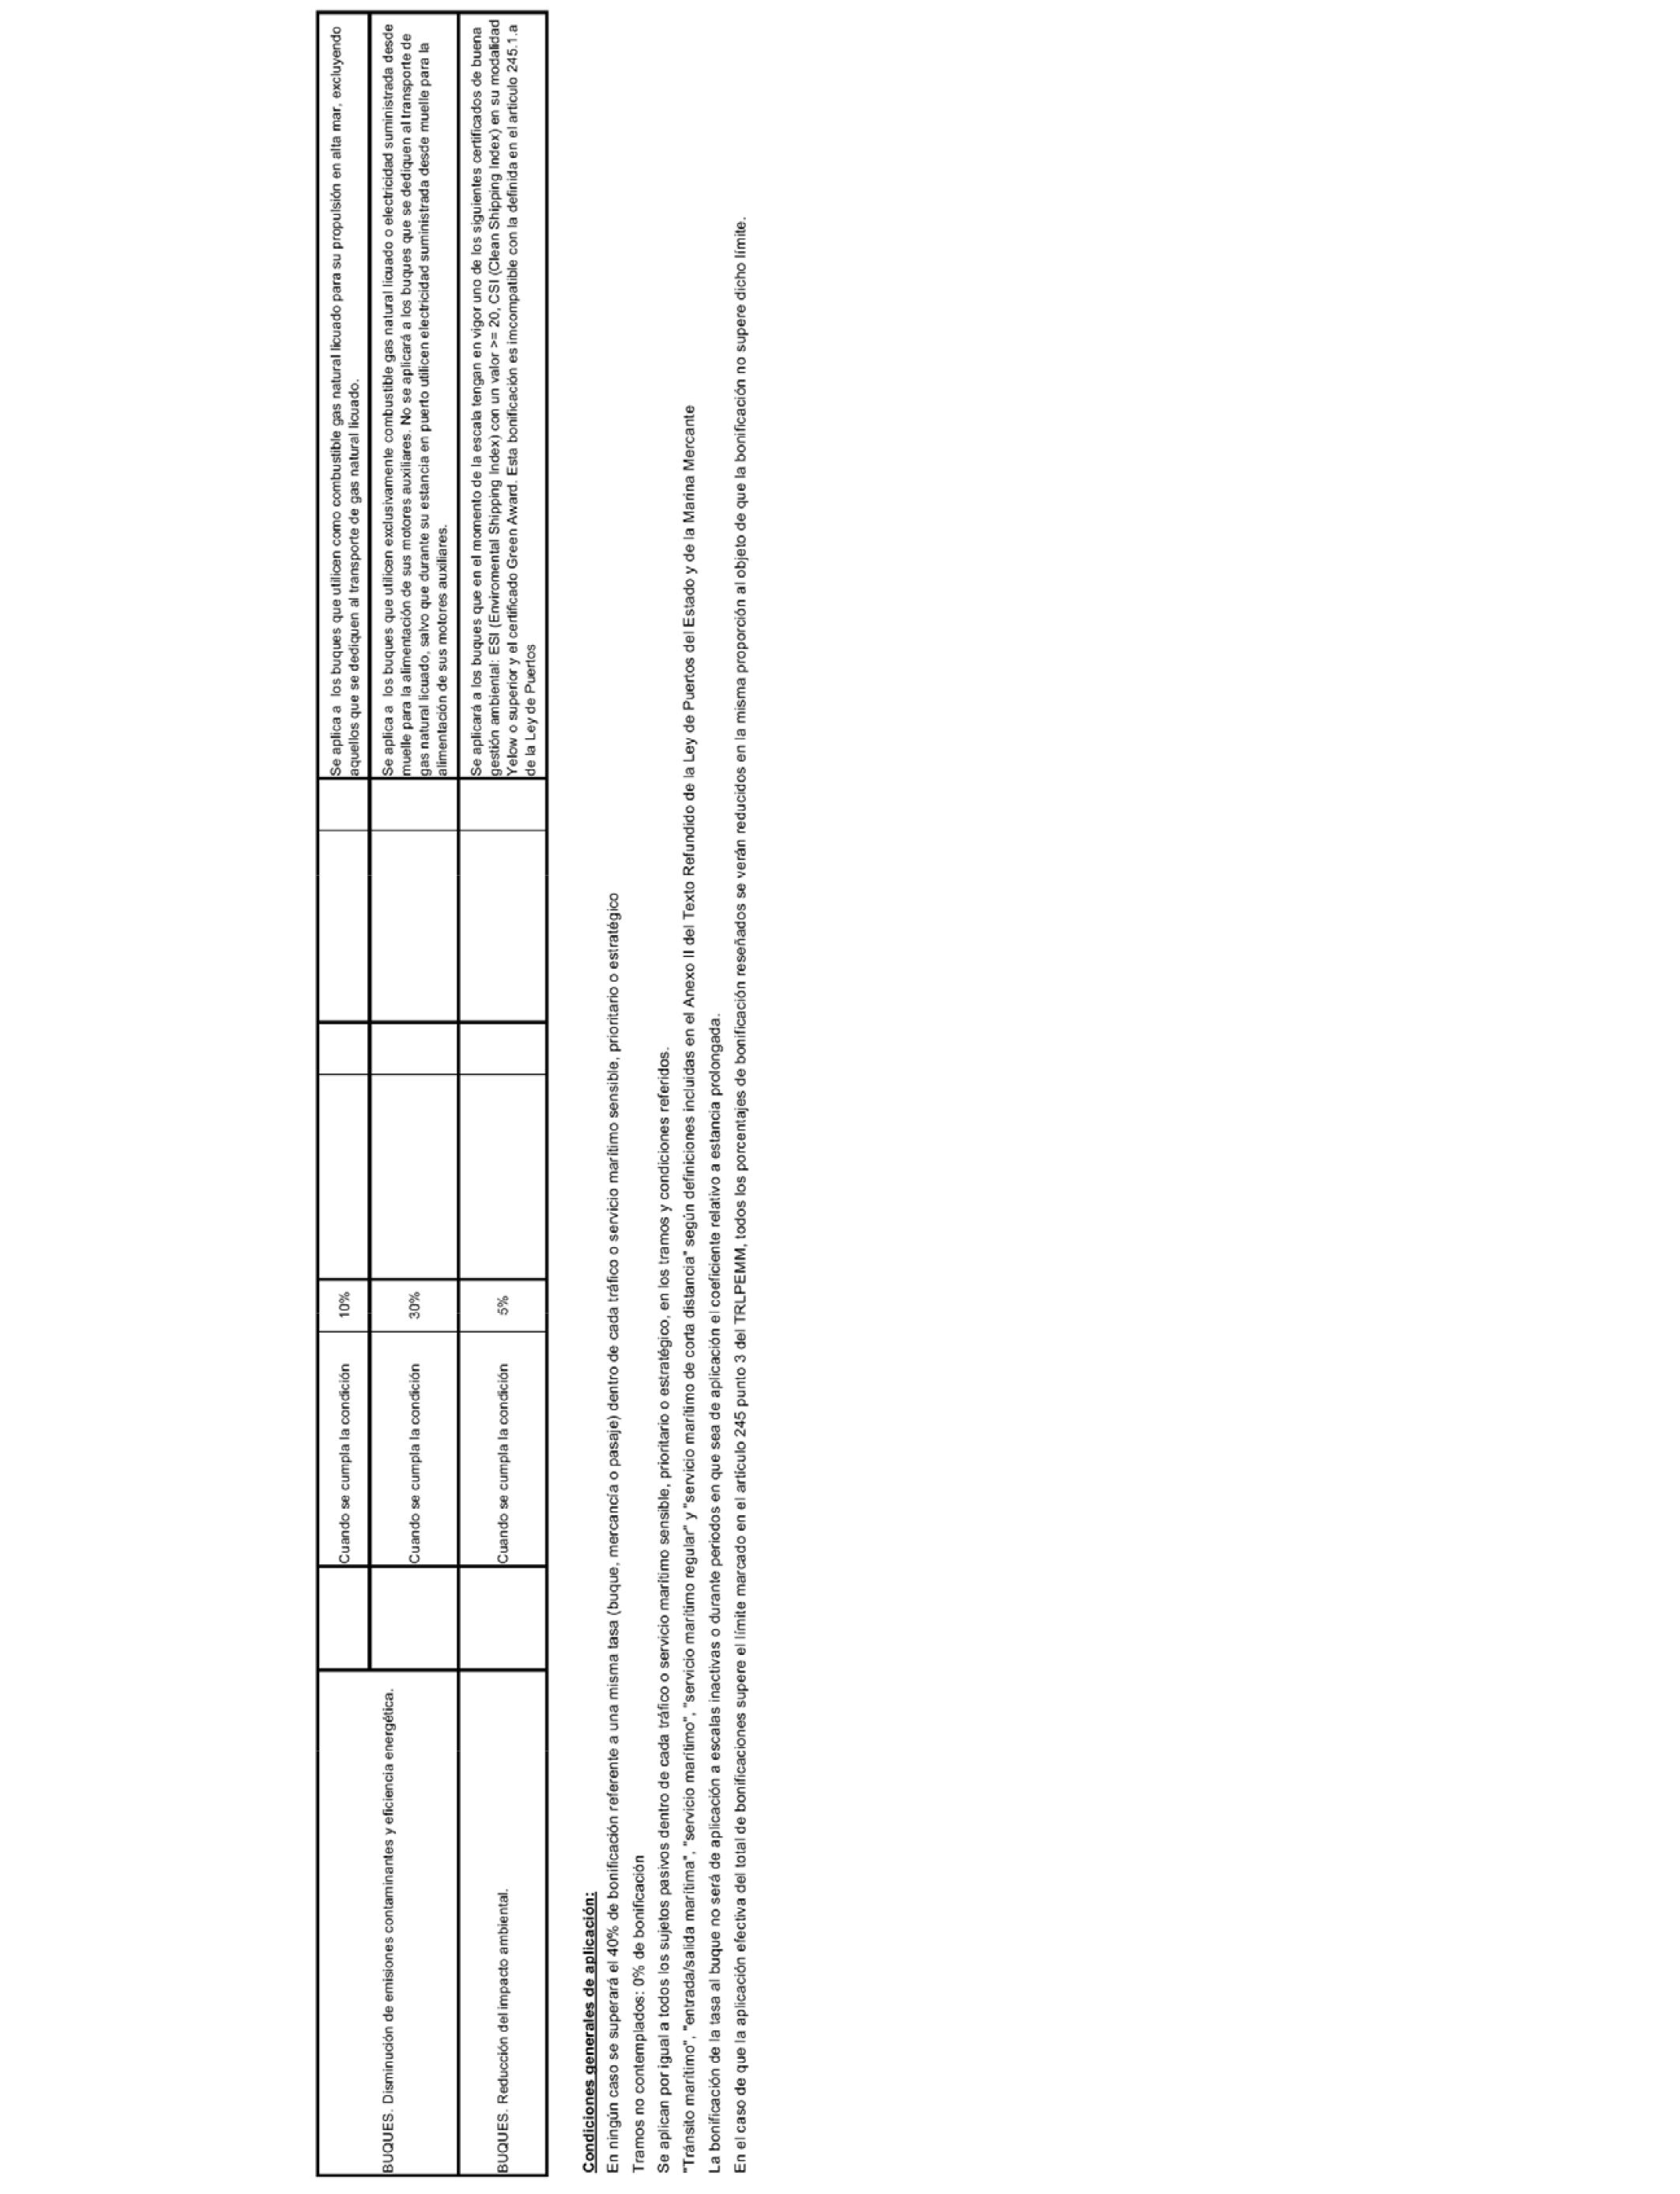 BOE.es - Documento BOE-A-2018-9268